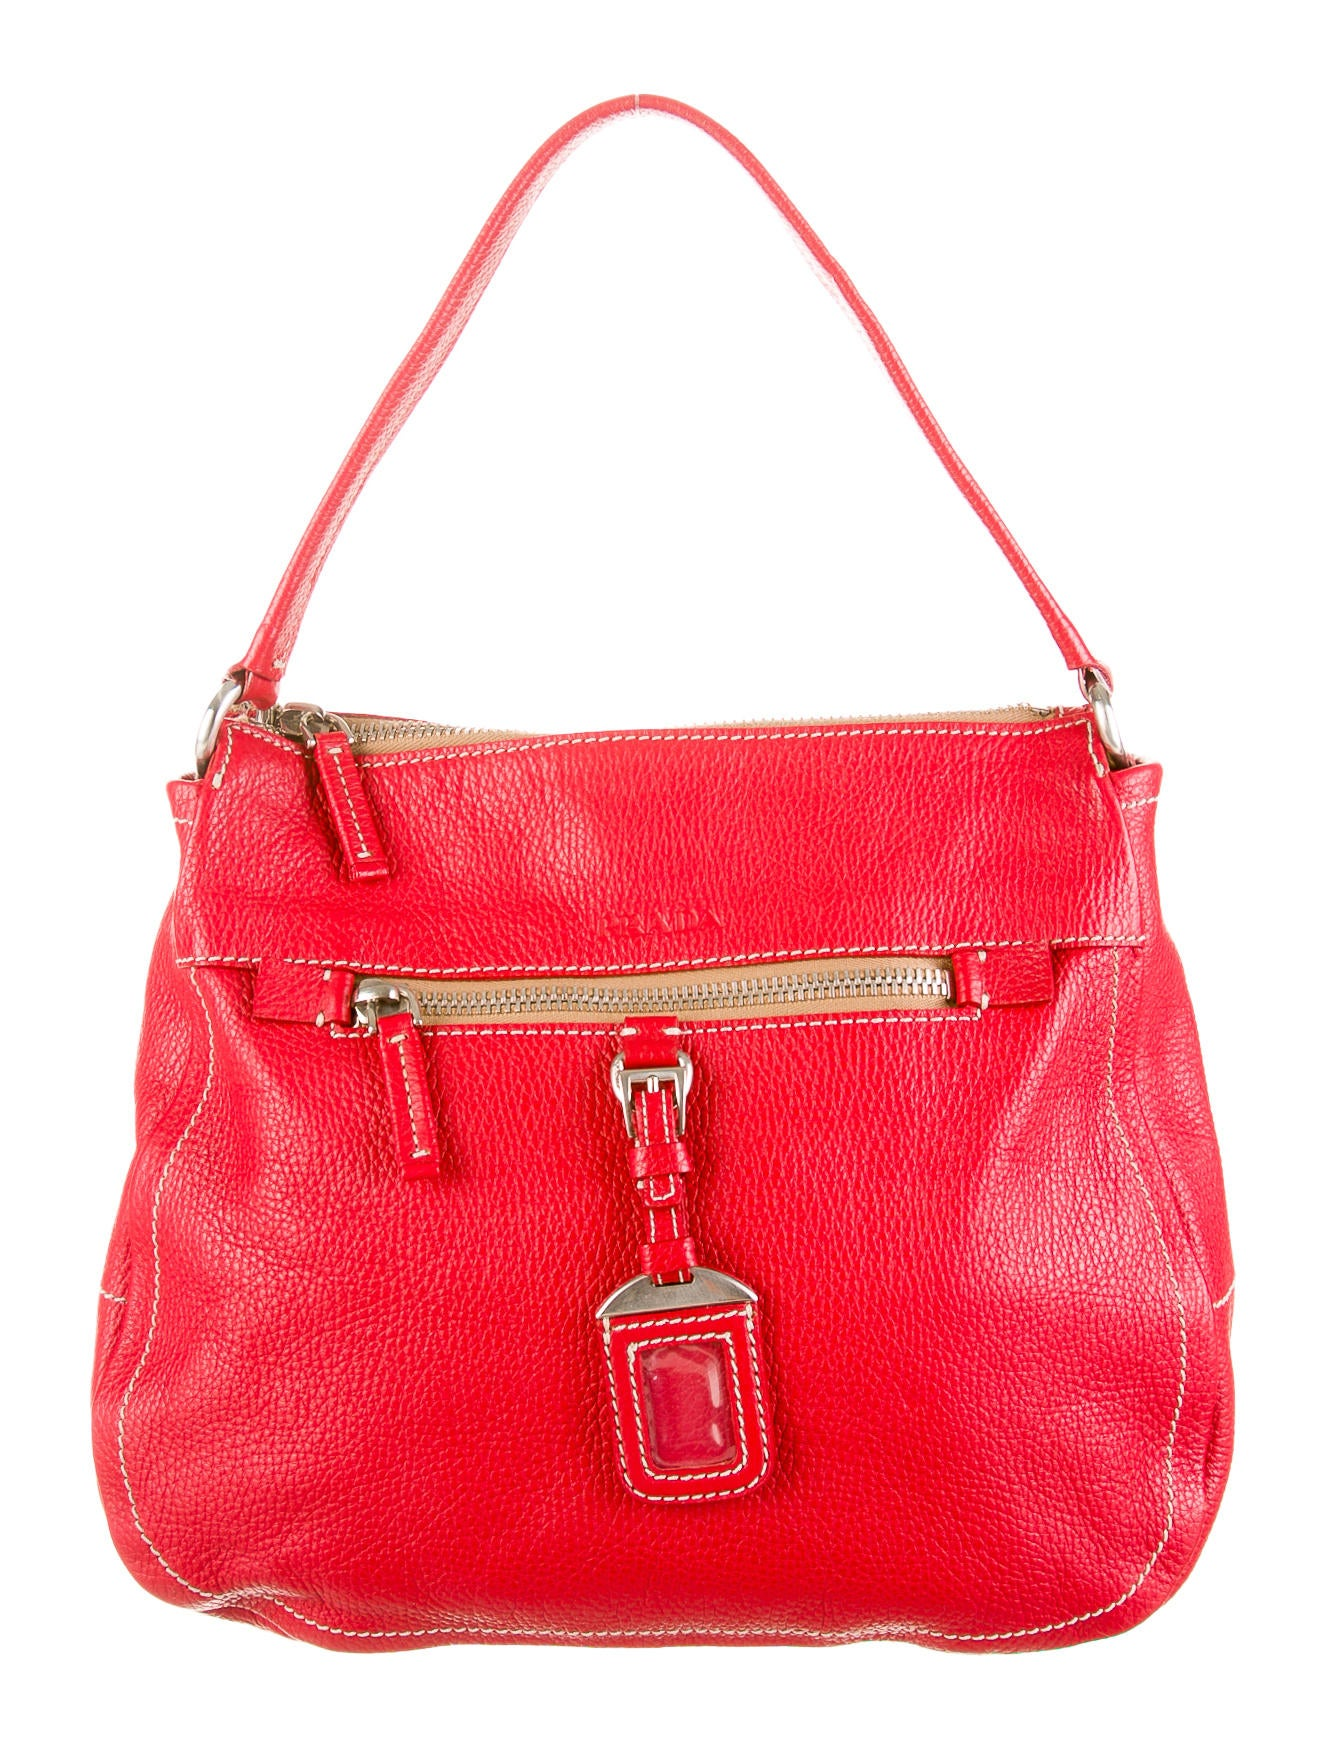 b492e3227d9d prada logo-accented shoulder bag